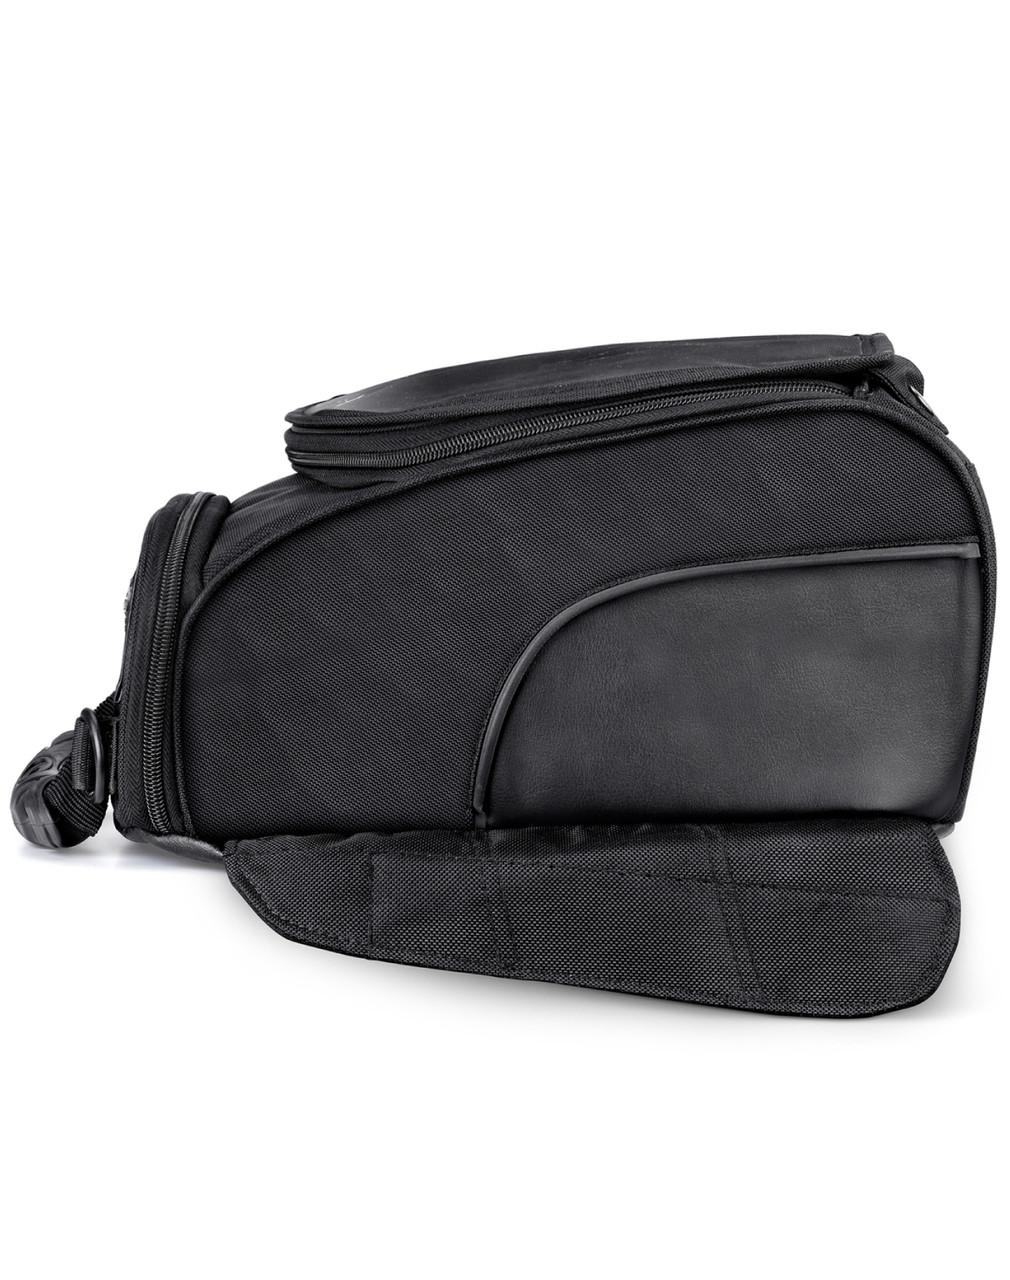 Viking 14 Medium Black Street/Sportbike Tank Bag Straight View